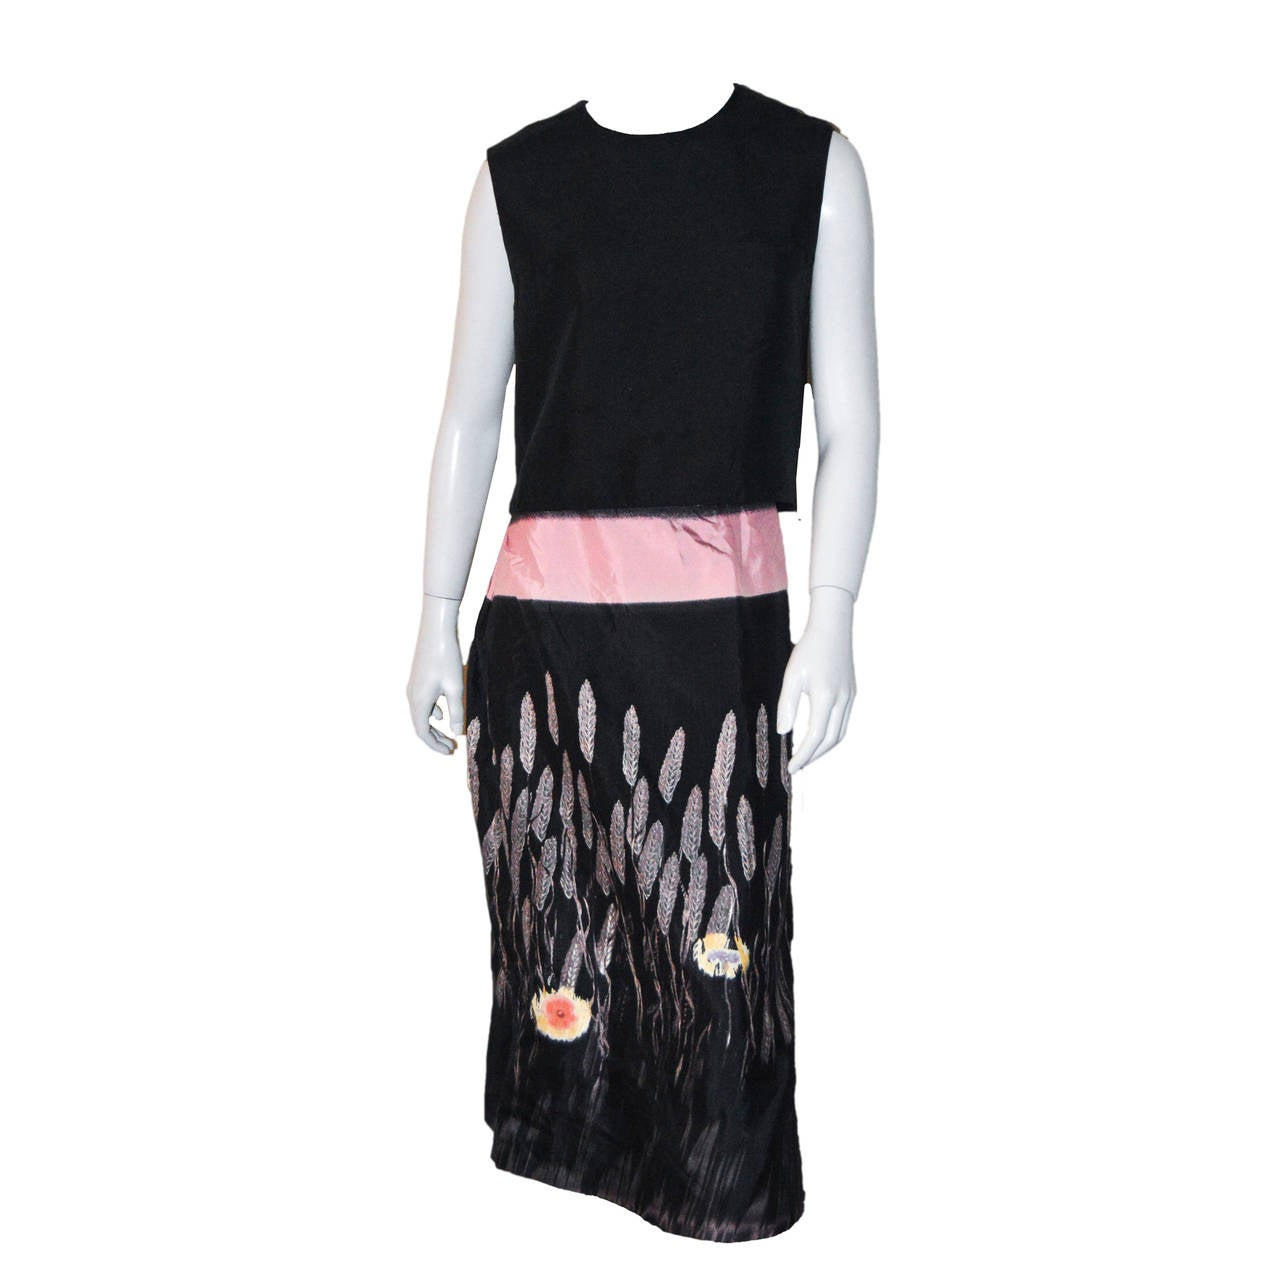 Prada 2 Piece Printed Skirt & Top Set